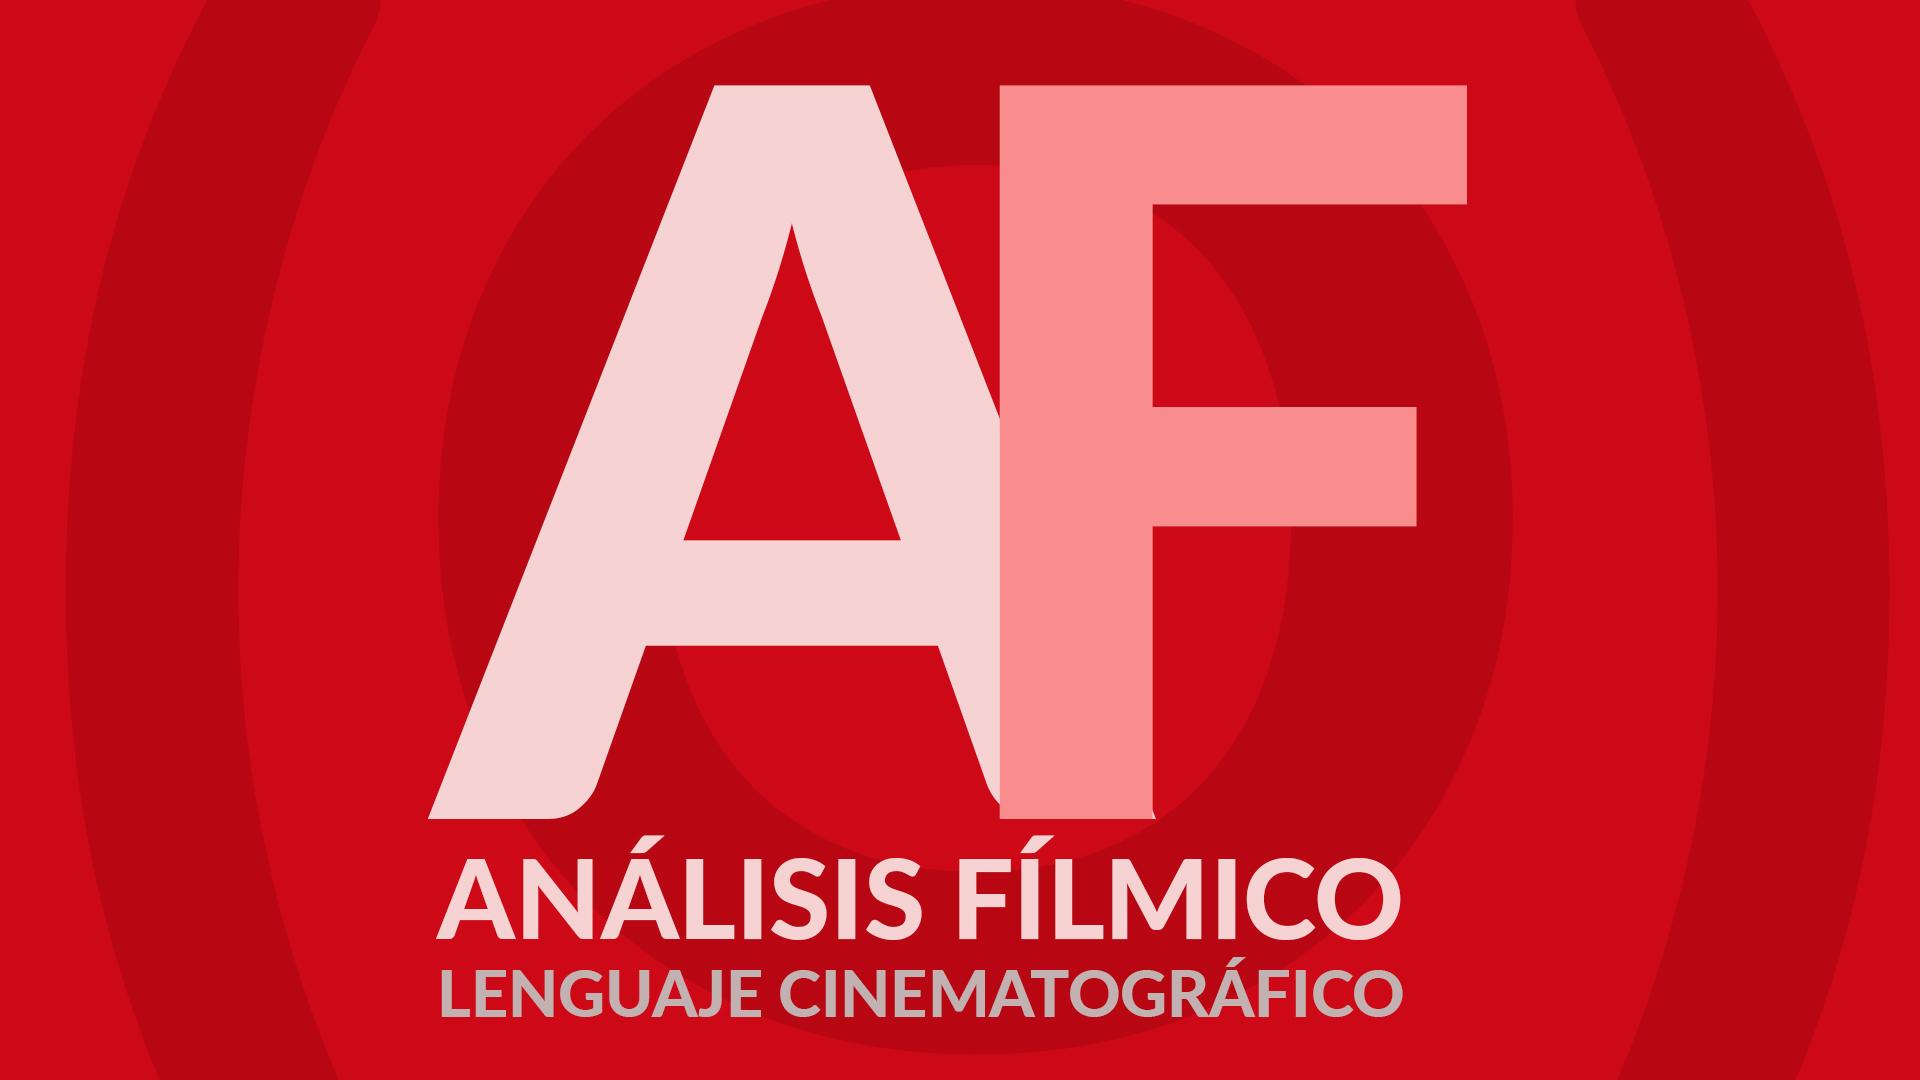 marc-nadal-analisis-cinematografico-logo